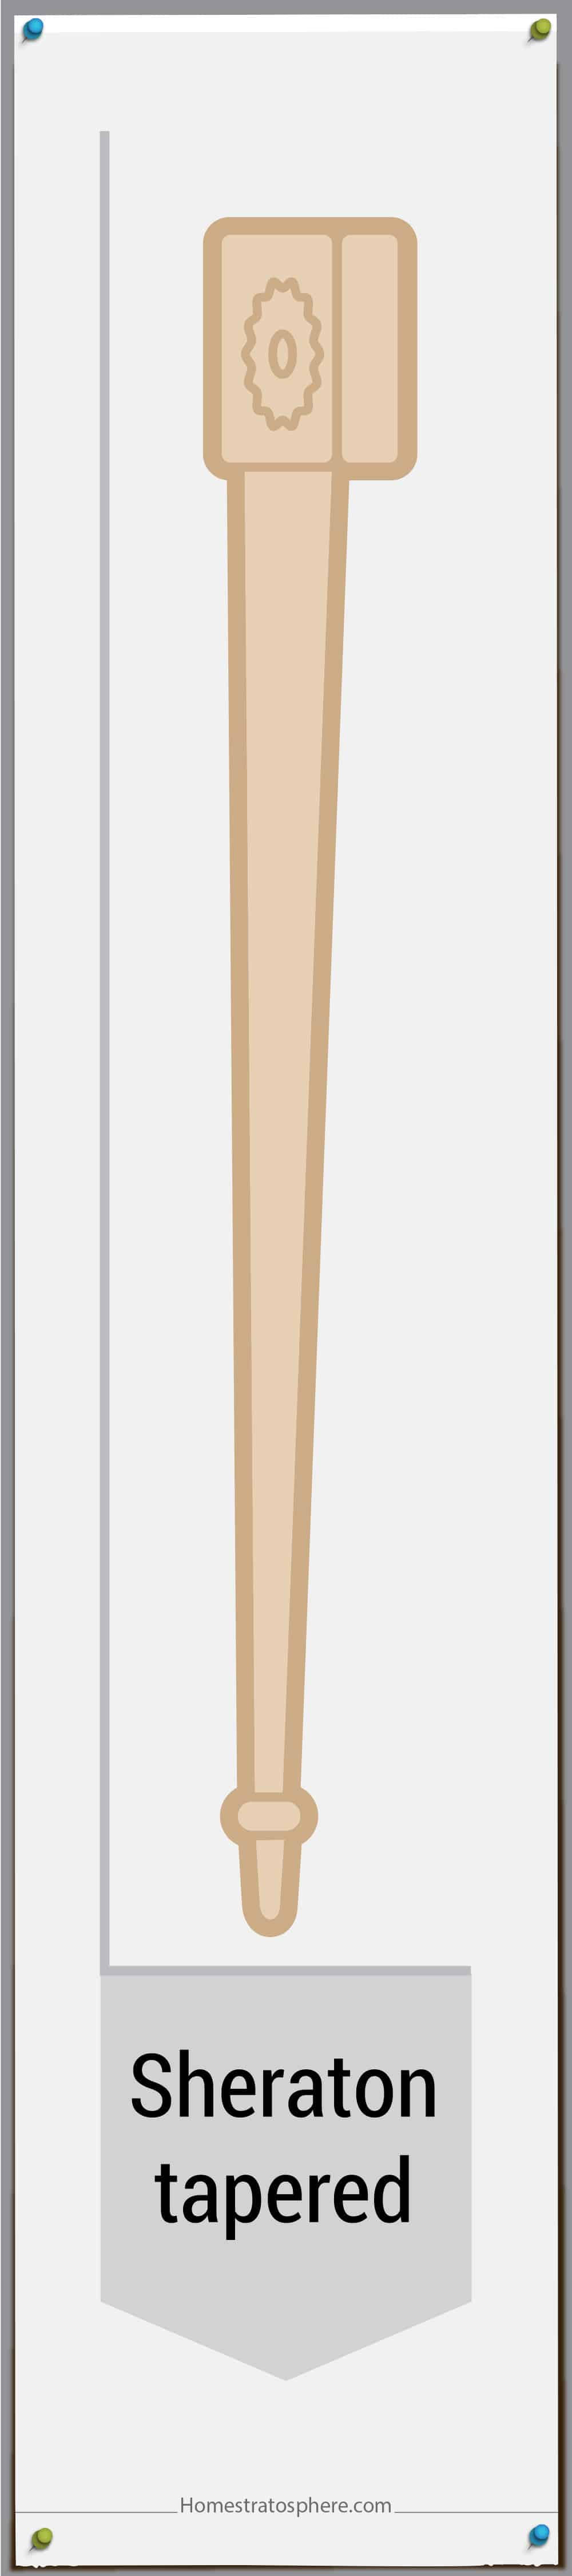 Sheraton Tapered furniture leg style